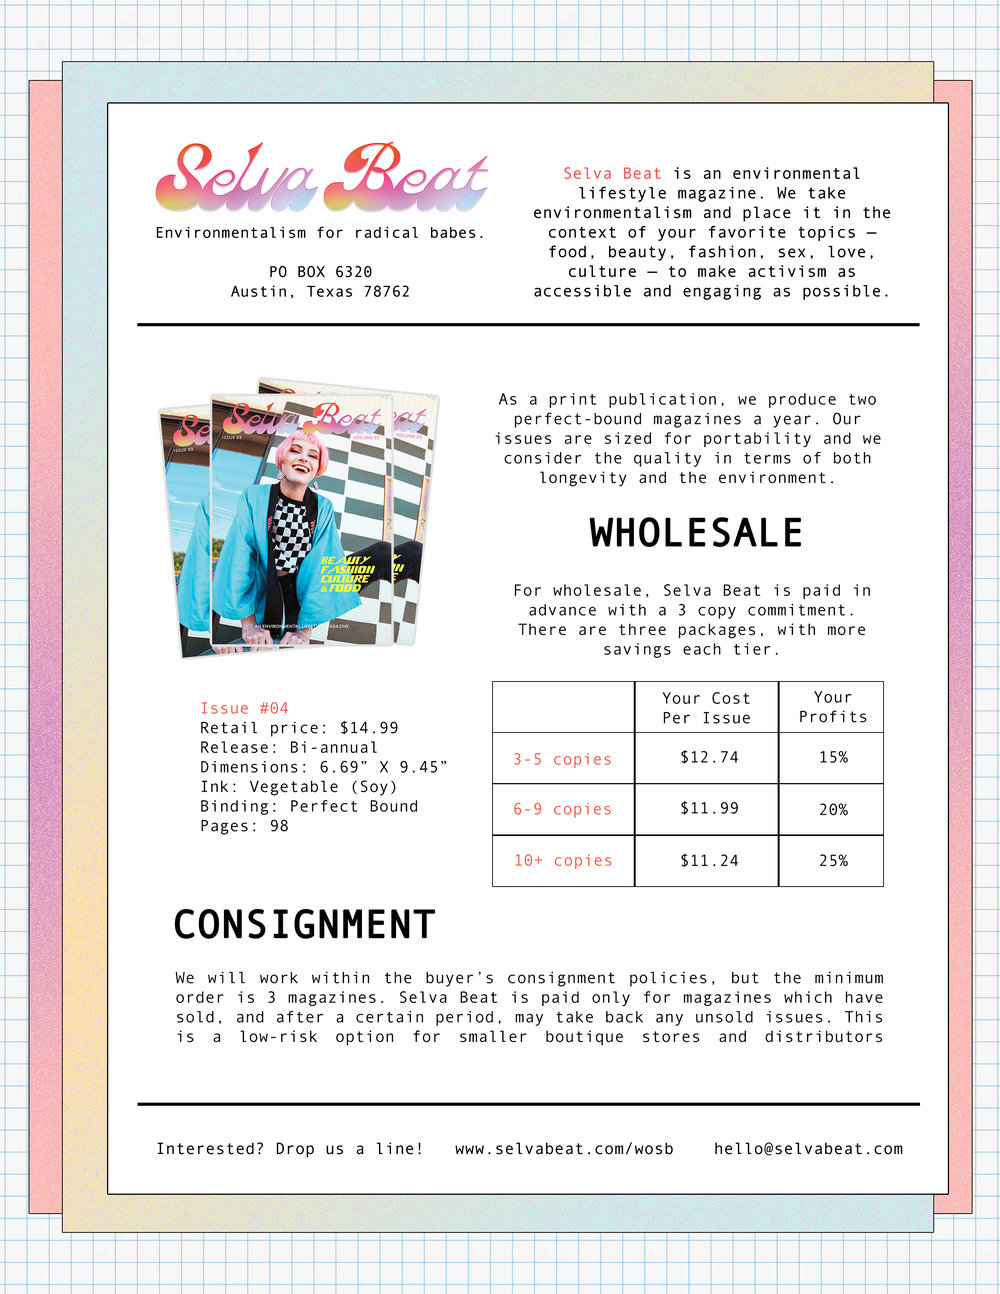 SelvaBeat-wholesale.jpg